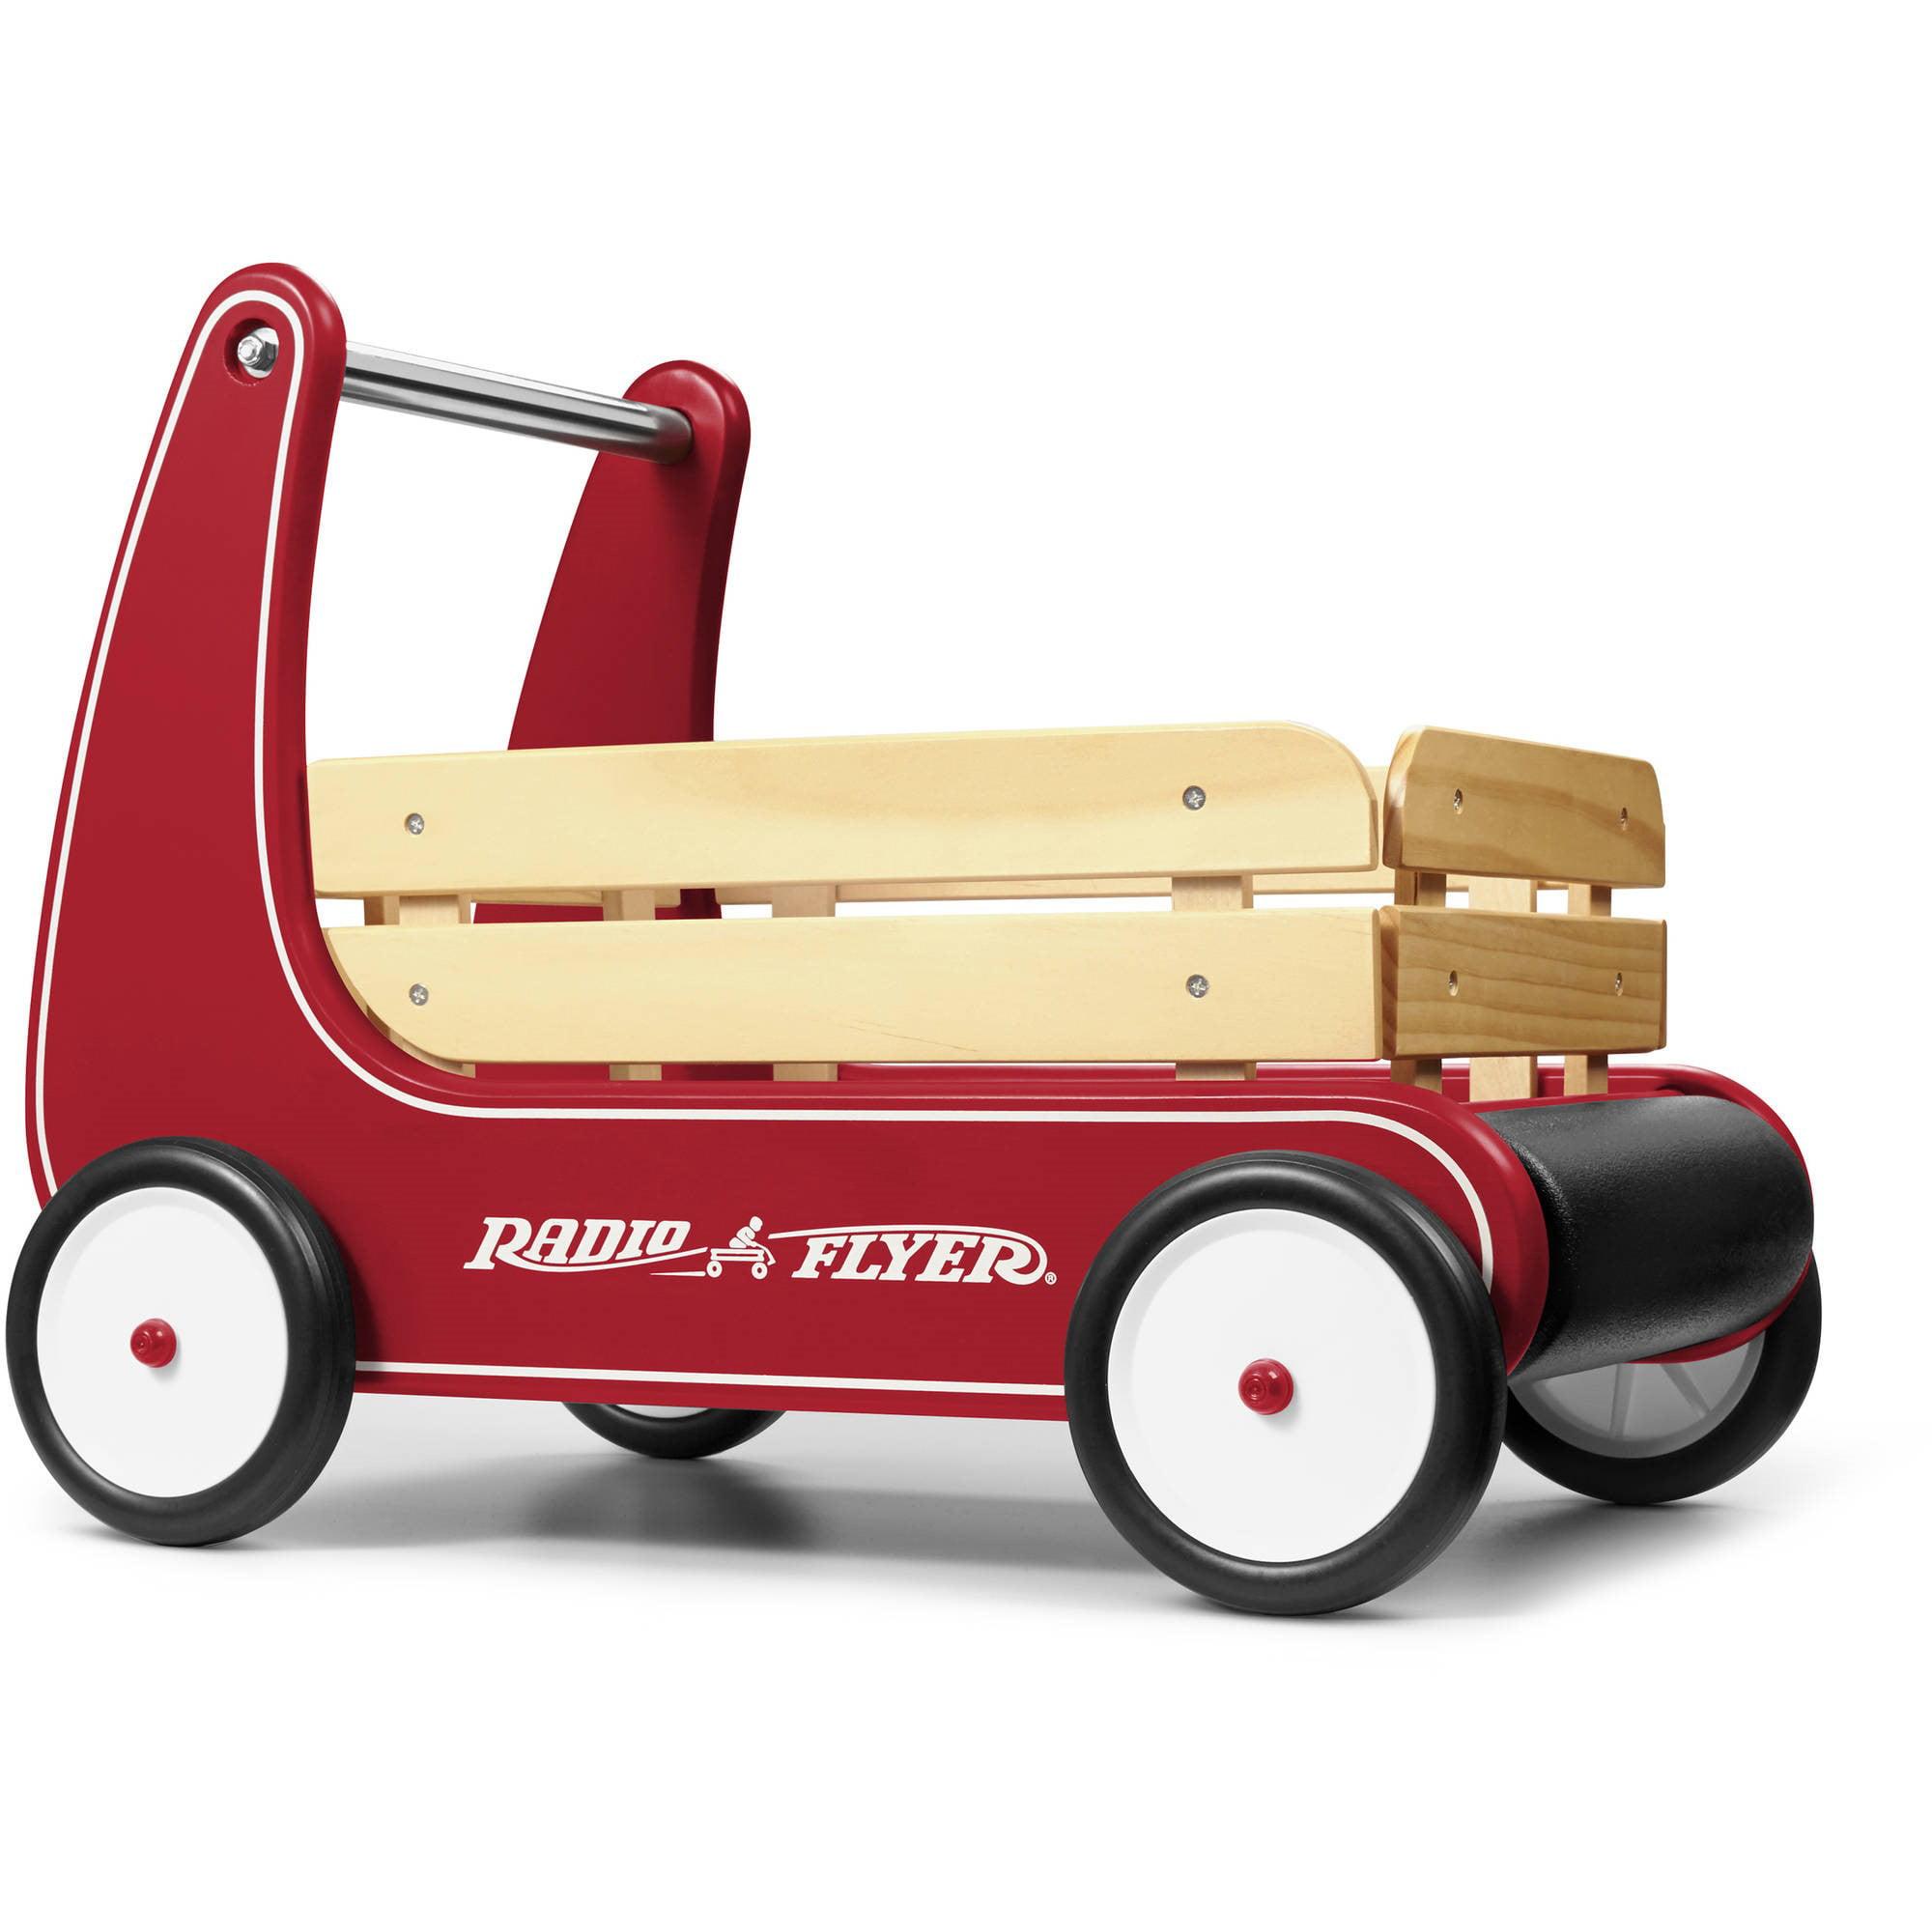 Radio Flyer, Classic Walker Wagon, Wood Push Walker, Red